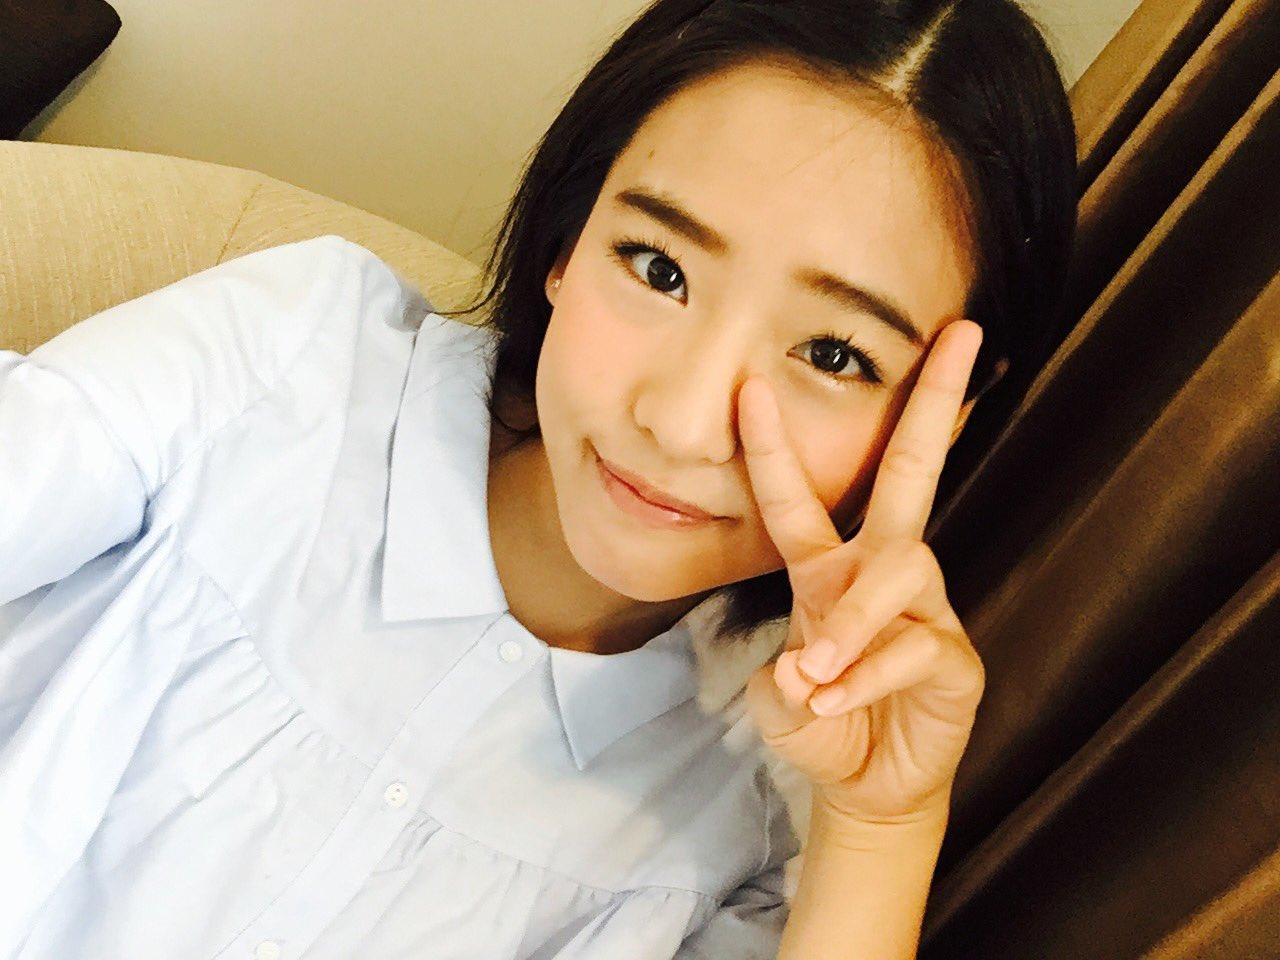 "Haruka Nakagawa: Haruka Nakagawa 仲川遥香 On Twitter: ""Morning💓 Nanti Ketemu HS"